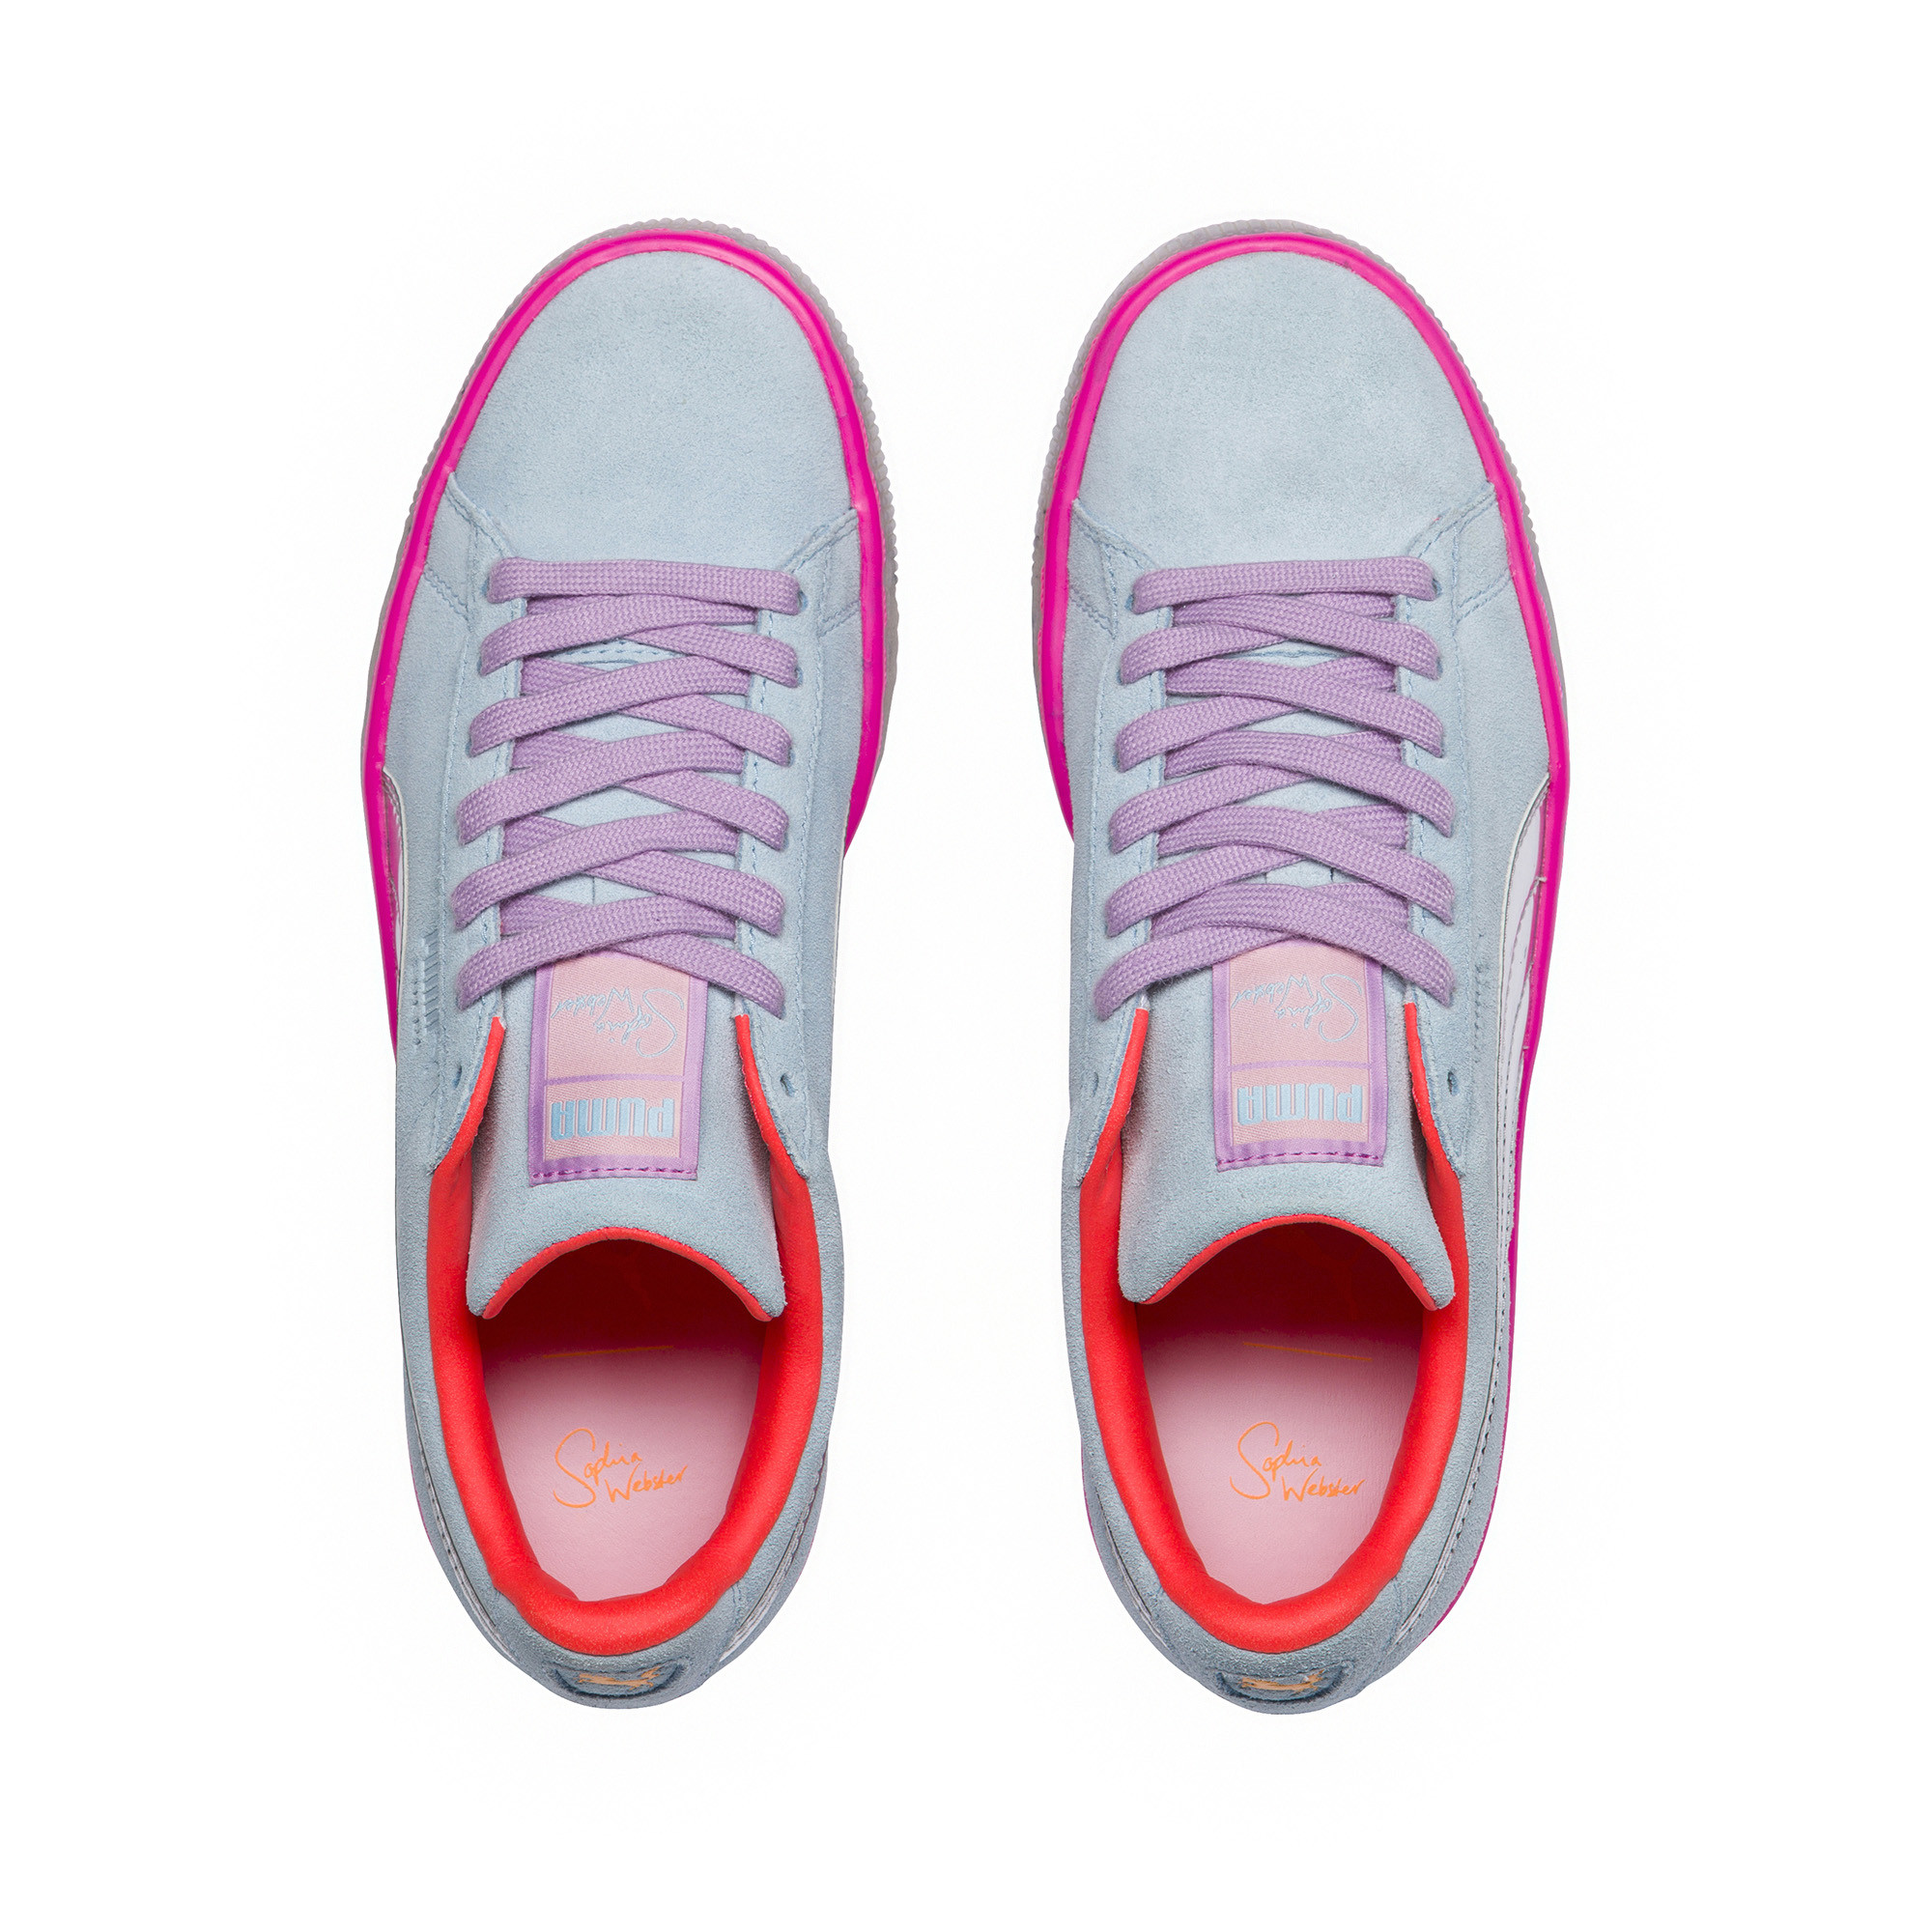 Image Puma PUMA x SOPHIA WEBSTER Women's Suede Candy Princess Sneakers #5